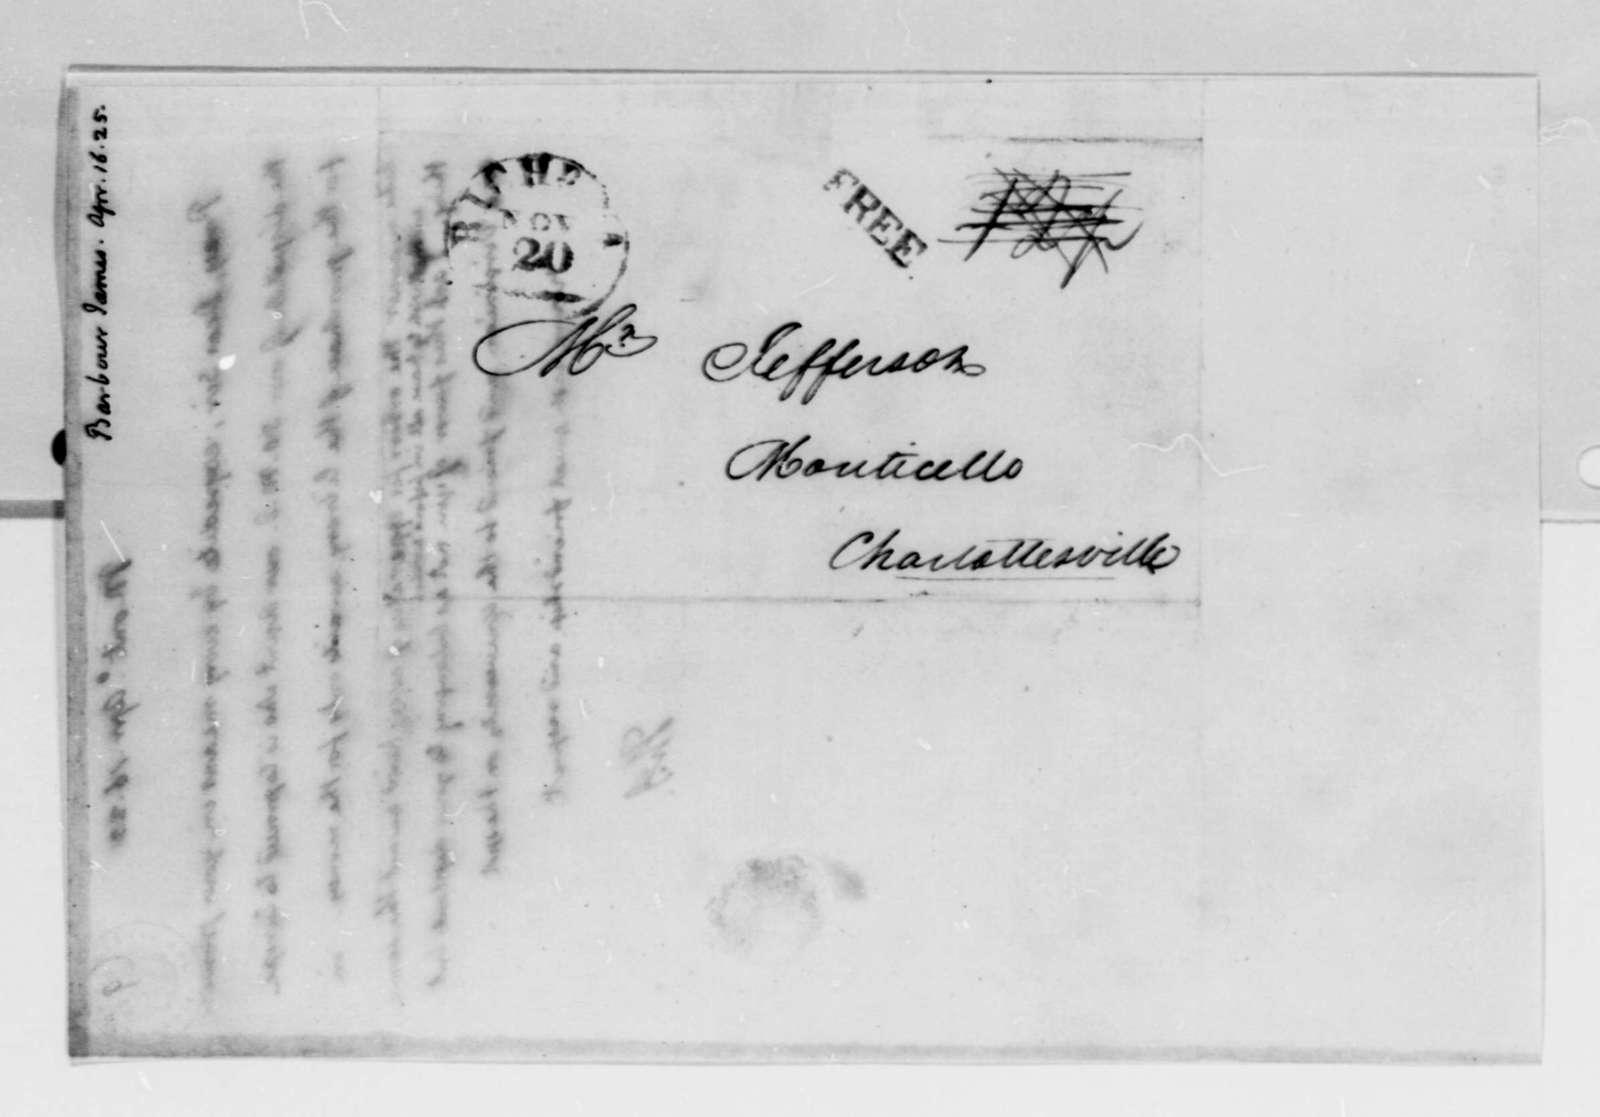 Thomas Jefferson to James Barbour, April 16, 1825